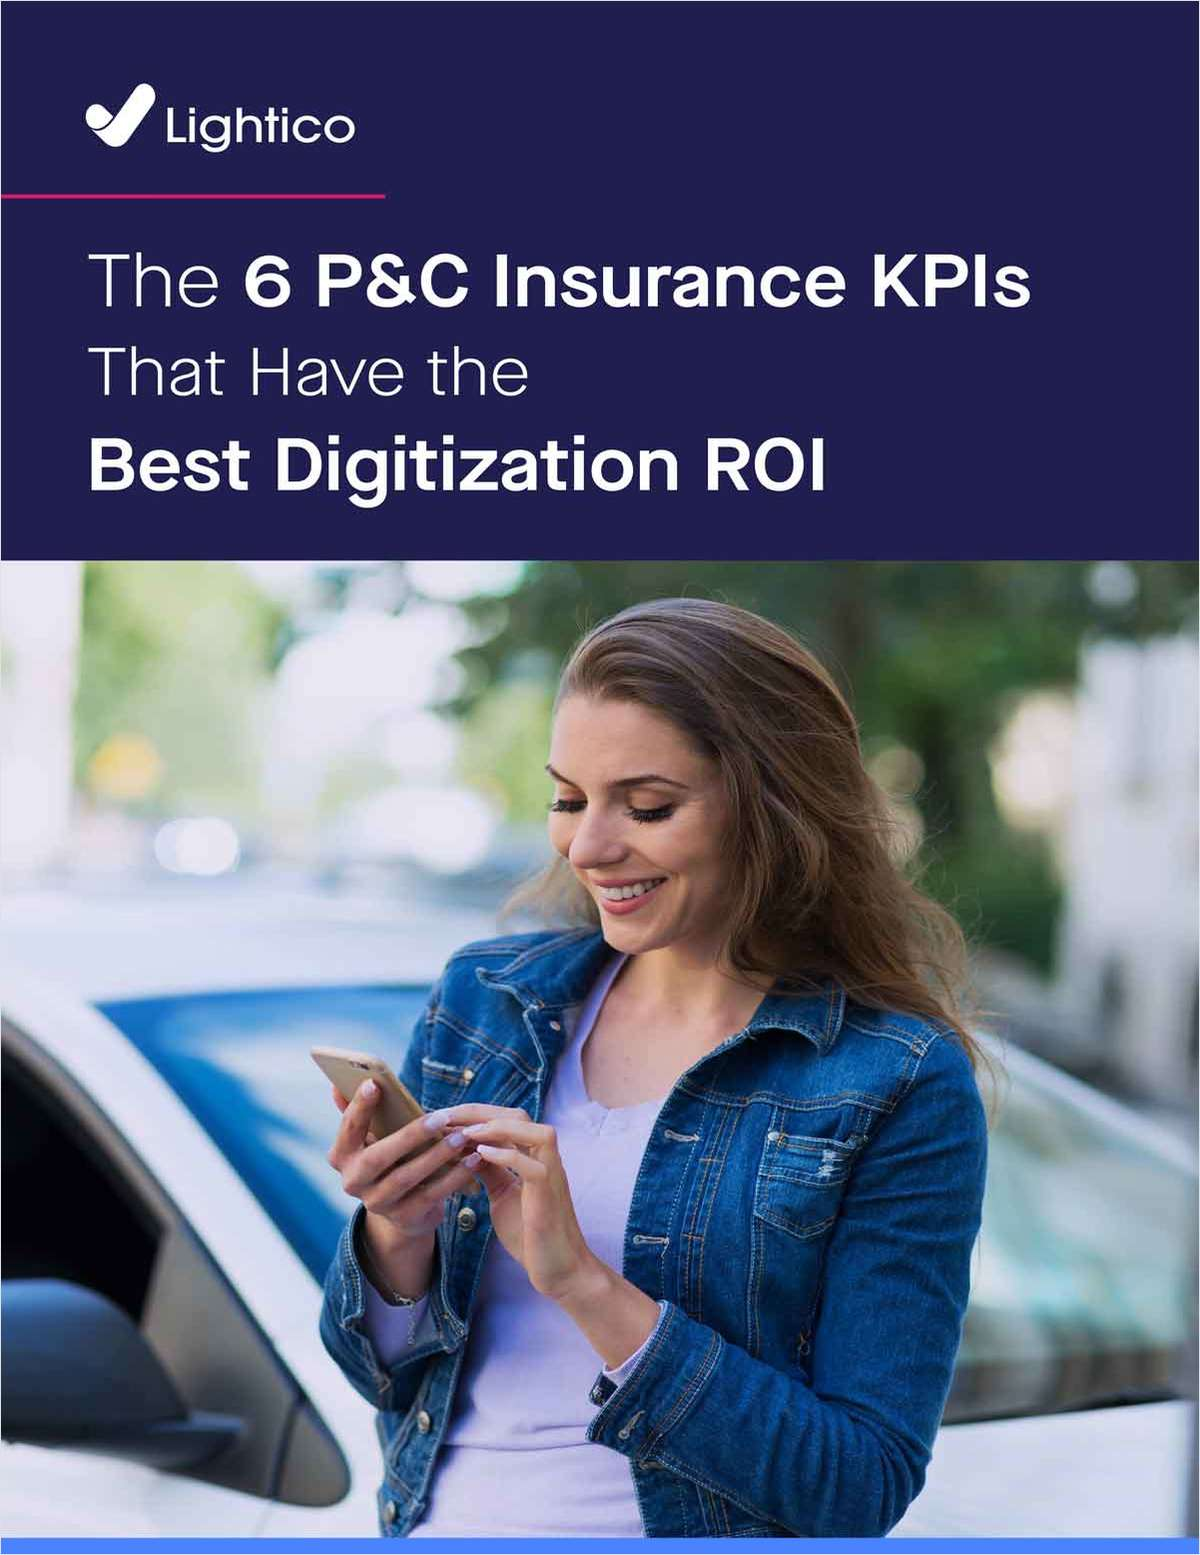 6 P&C Insurance KPIs That Have the Best Digitization ROI